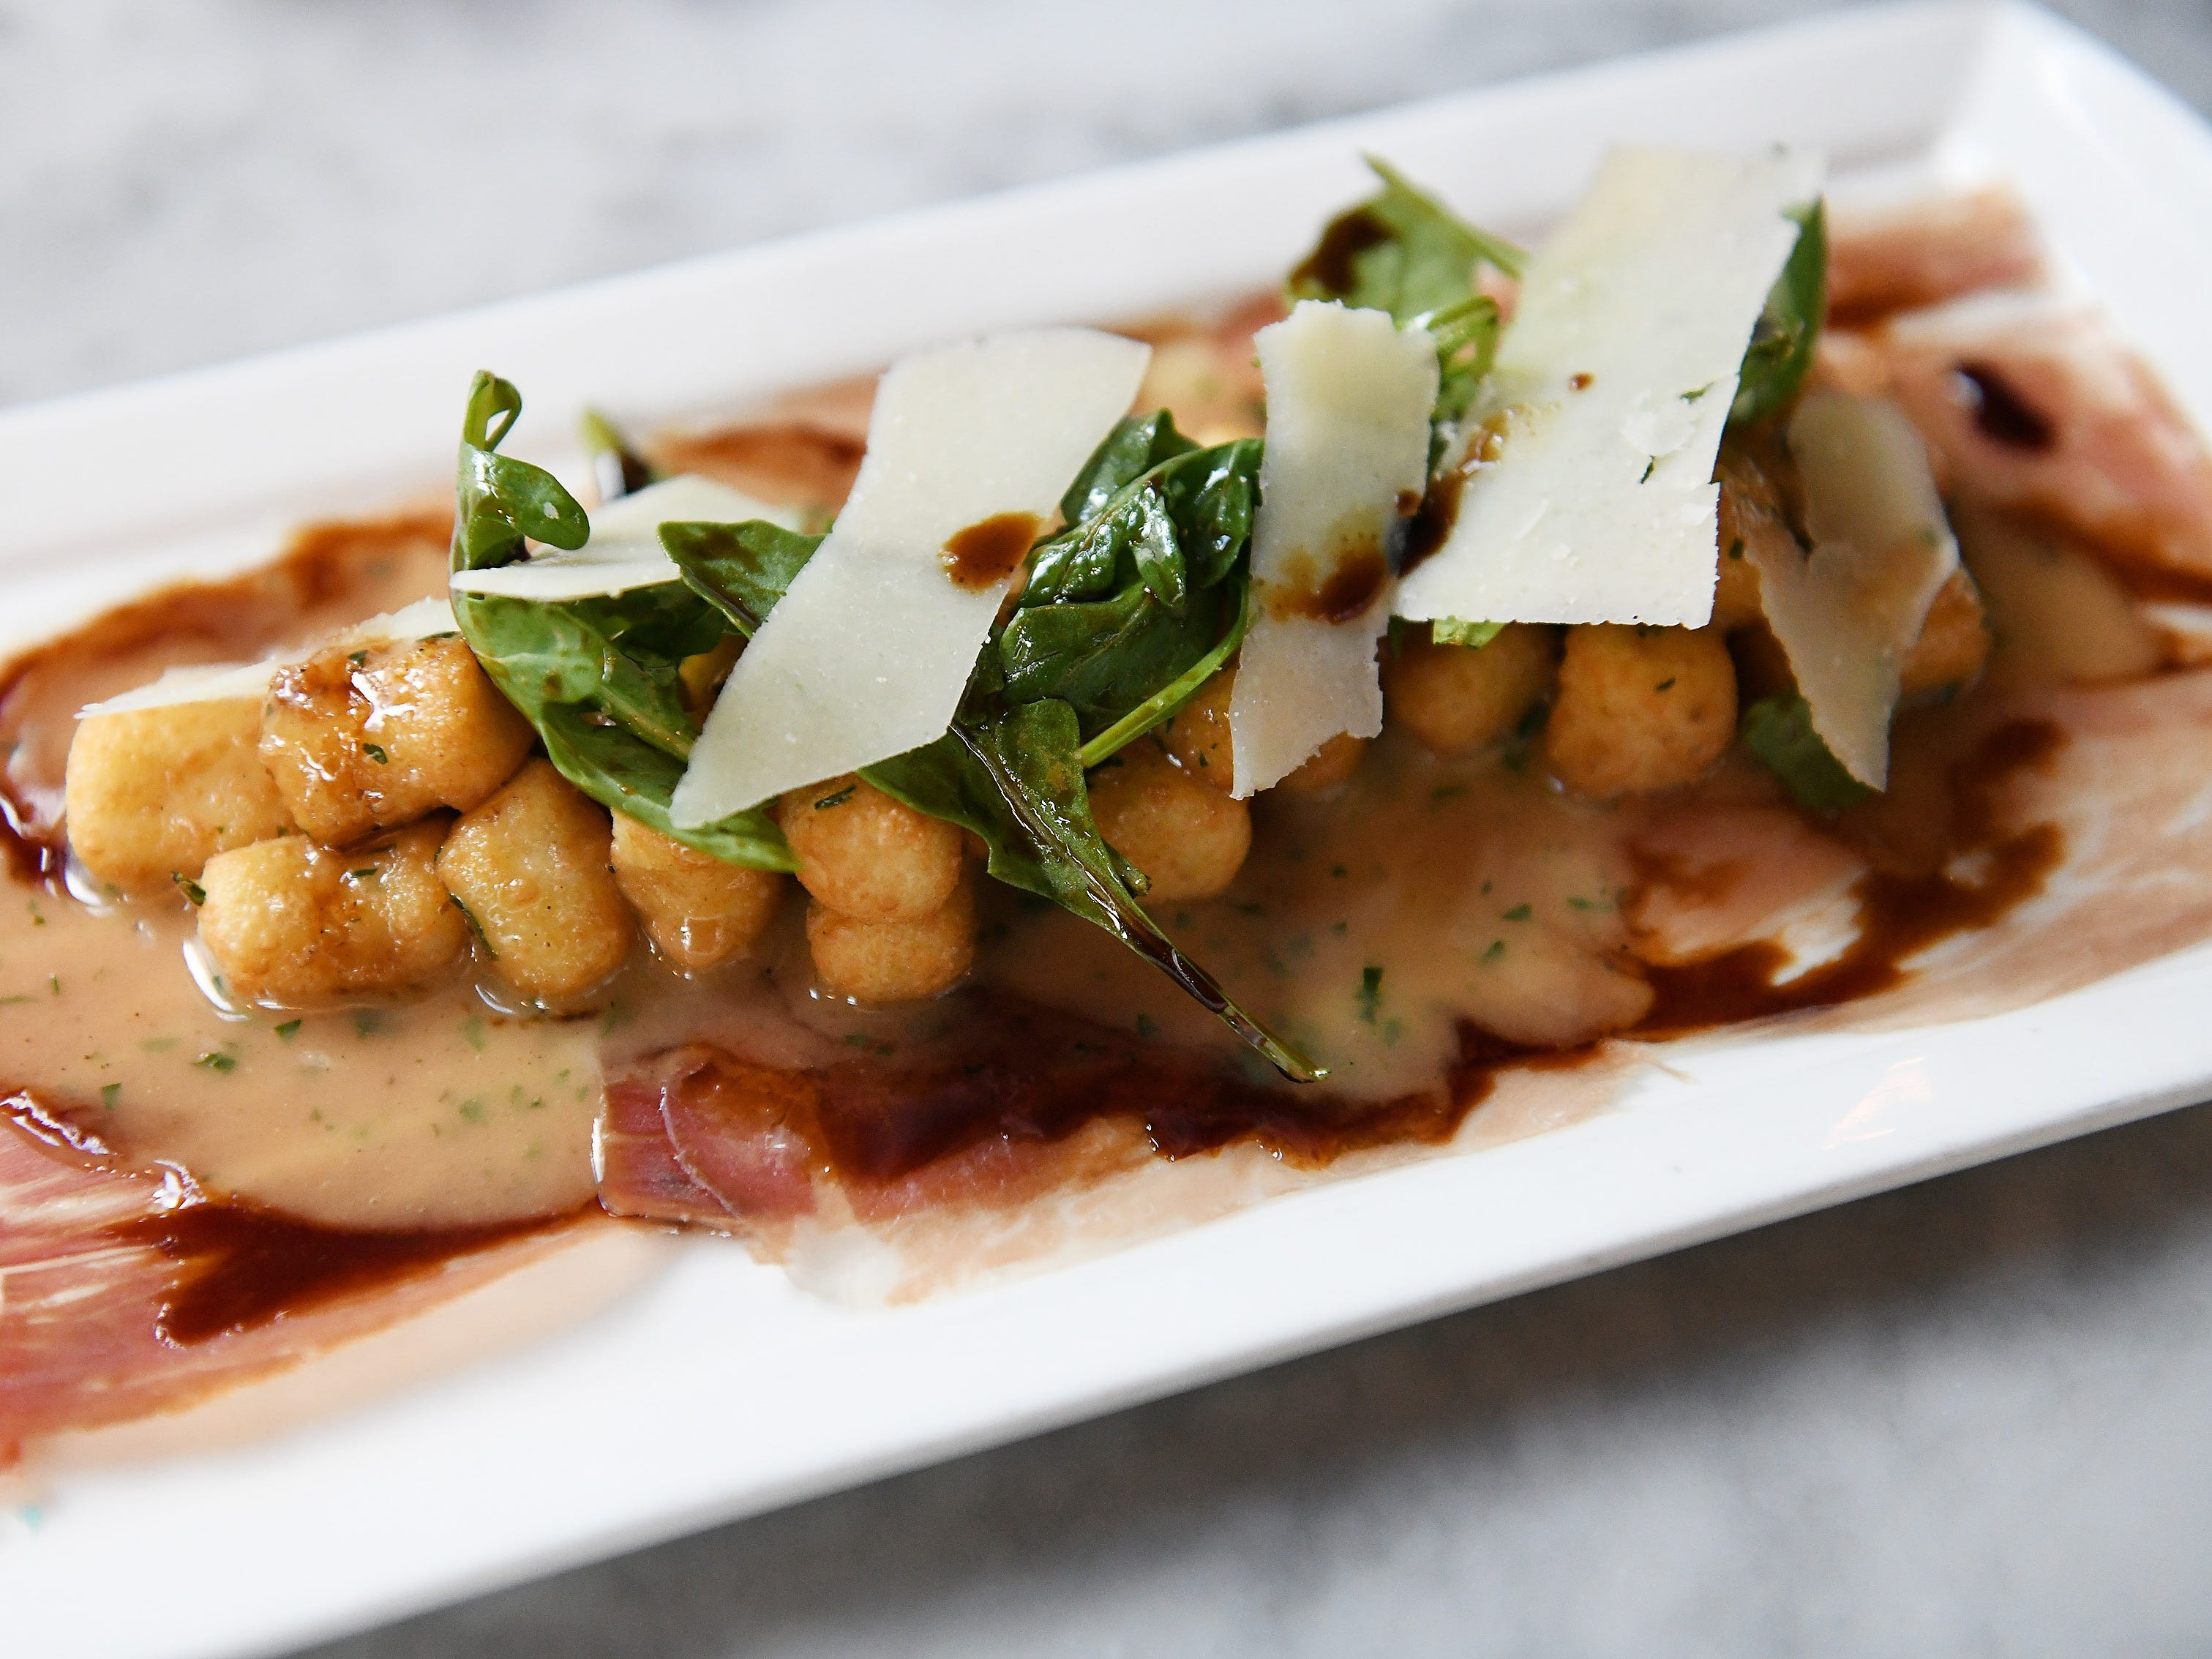 Parisian gnocchi with parma prosciutto, arugula, shaved Parmesan and saba. (Robin Buckson / The Detroit News)